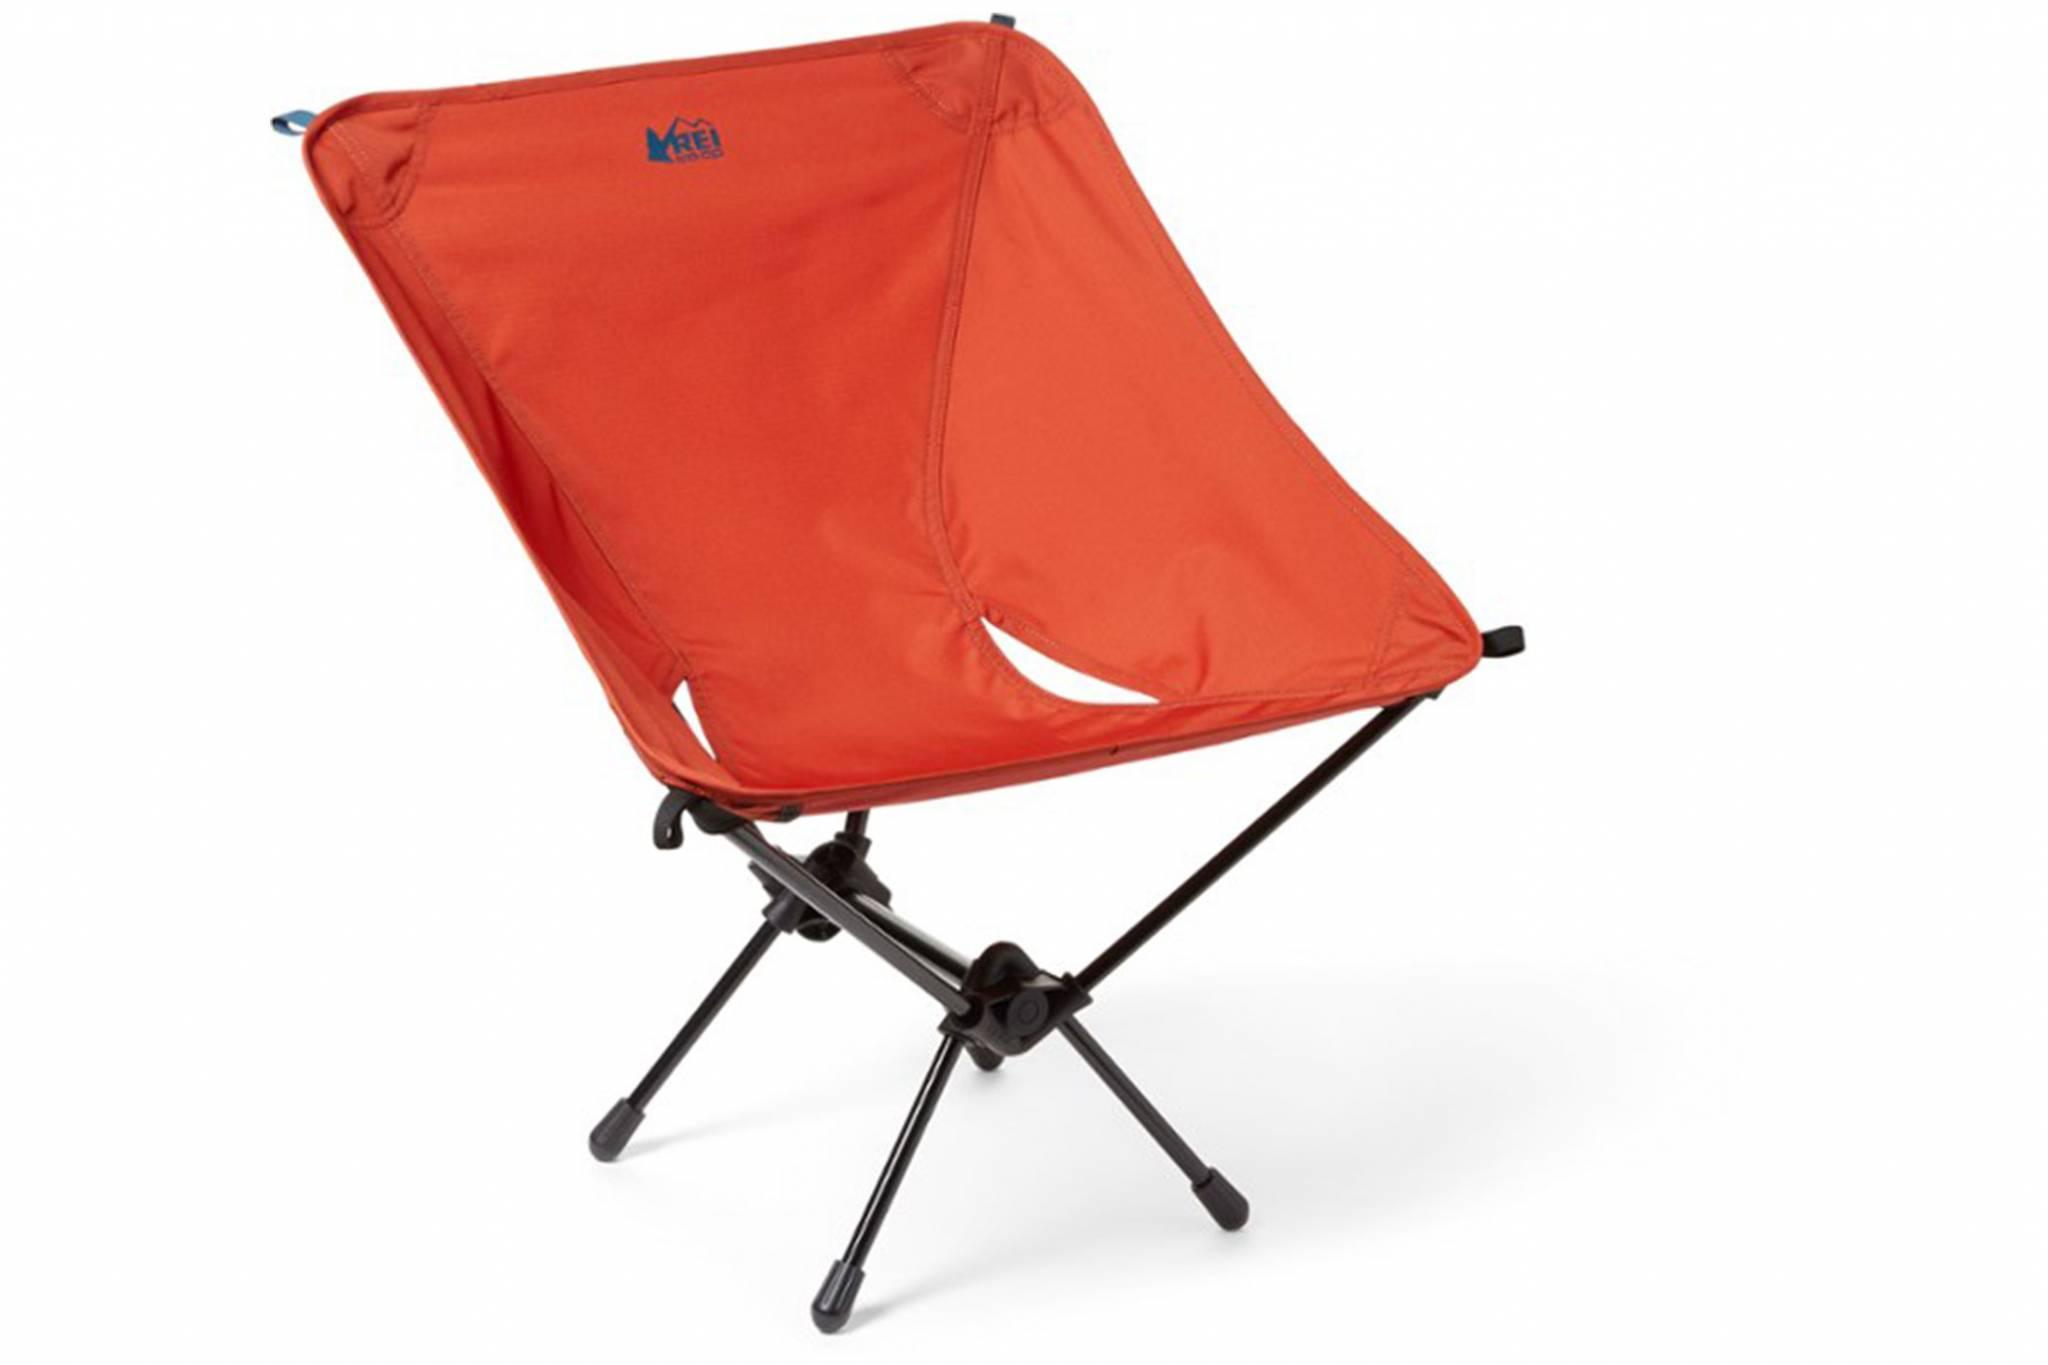 REI Flexlite Camping Chair